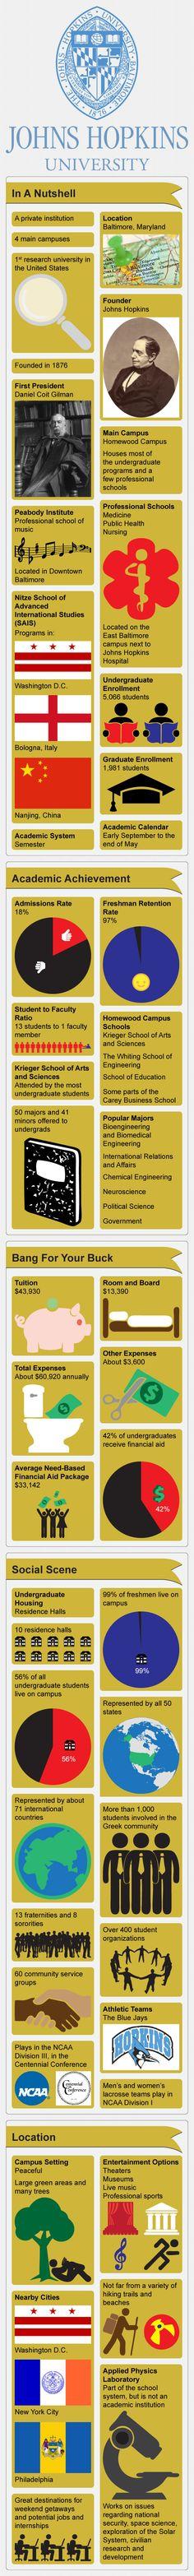 John Hopkins University Infographic